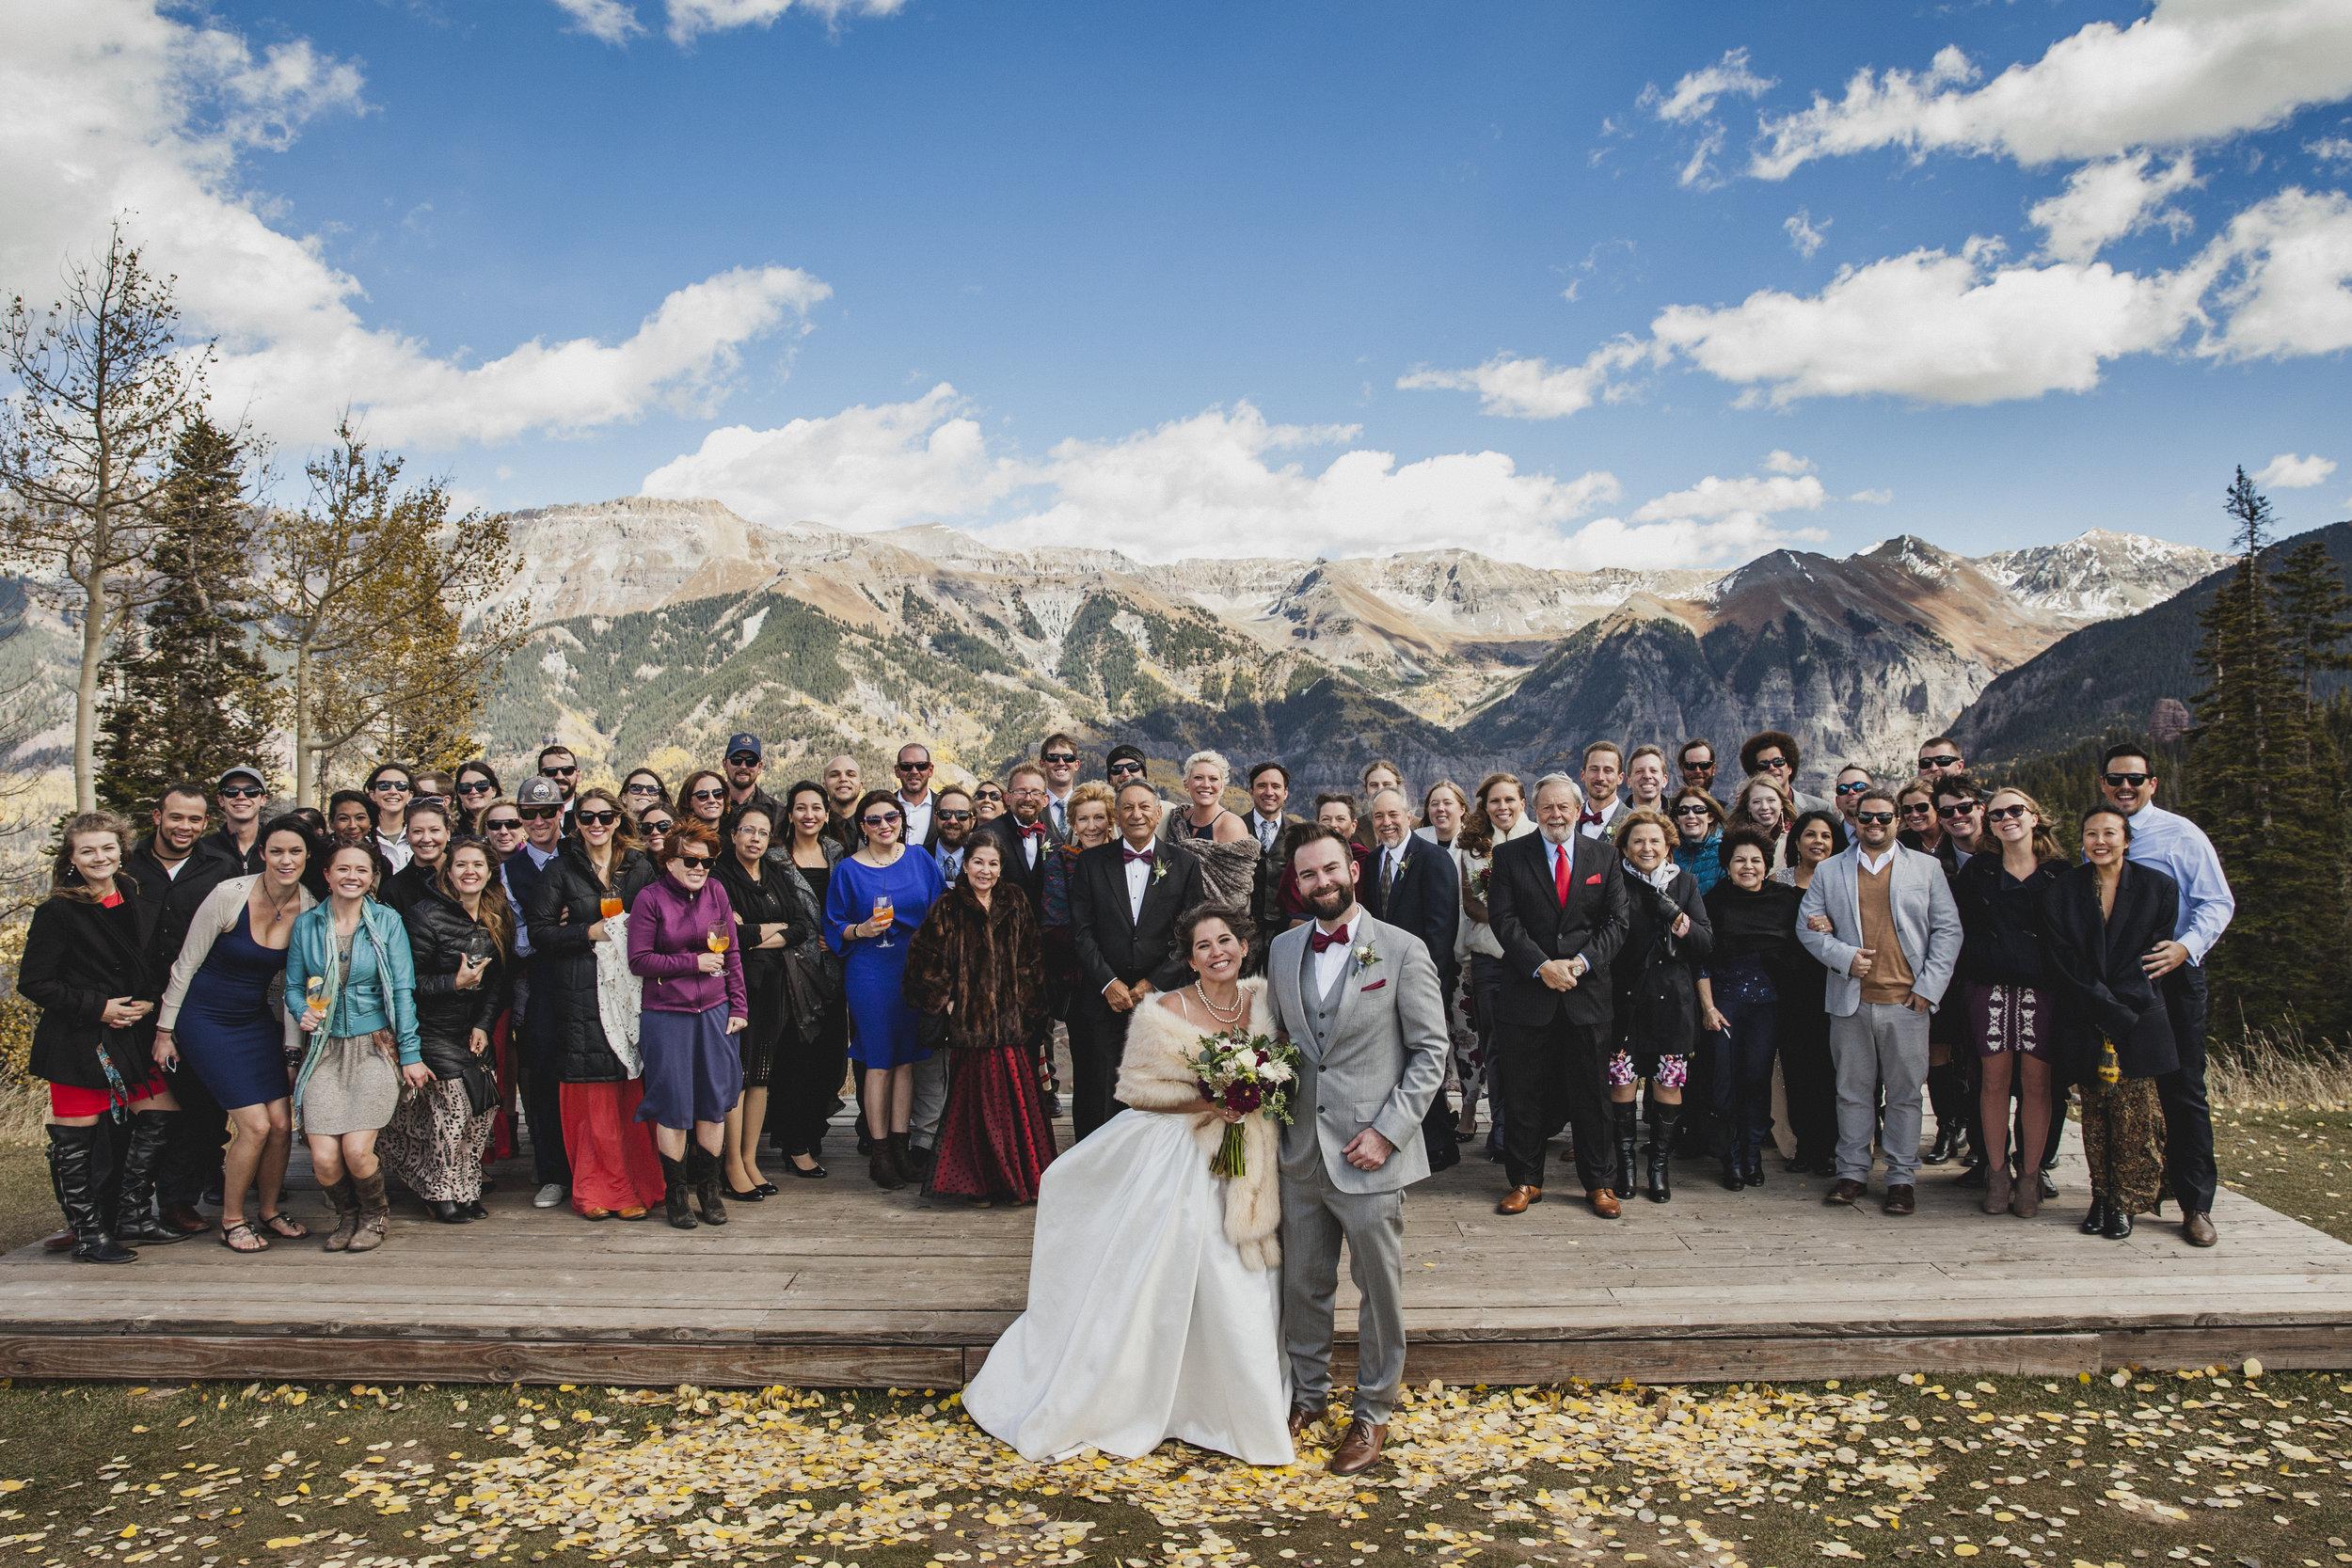 NE-LeahandAshtonphotography-Telluride-Wedding-Photography-6897.jpg